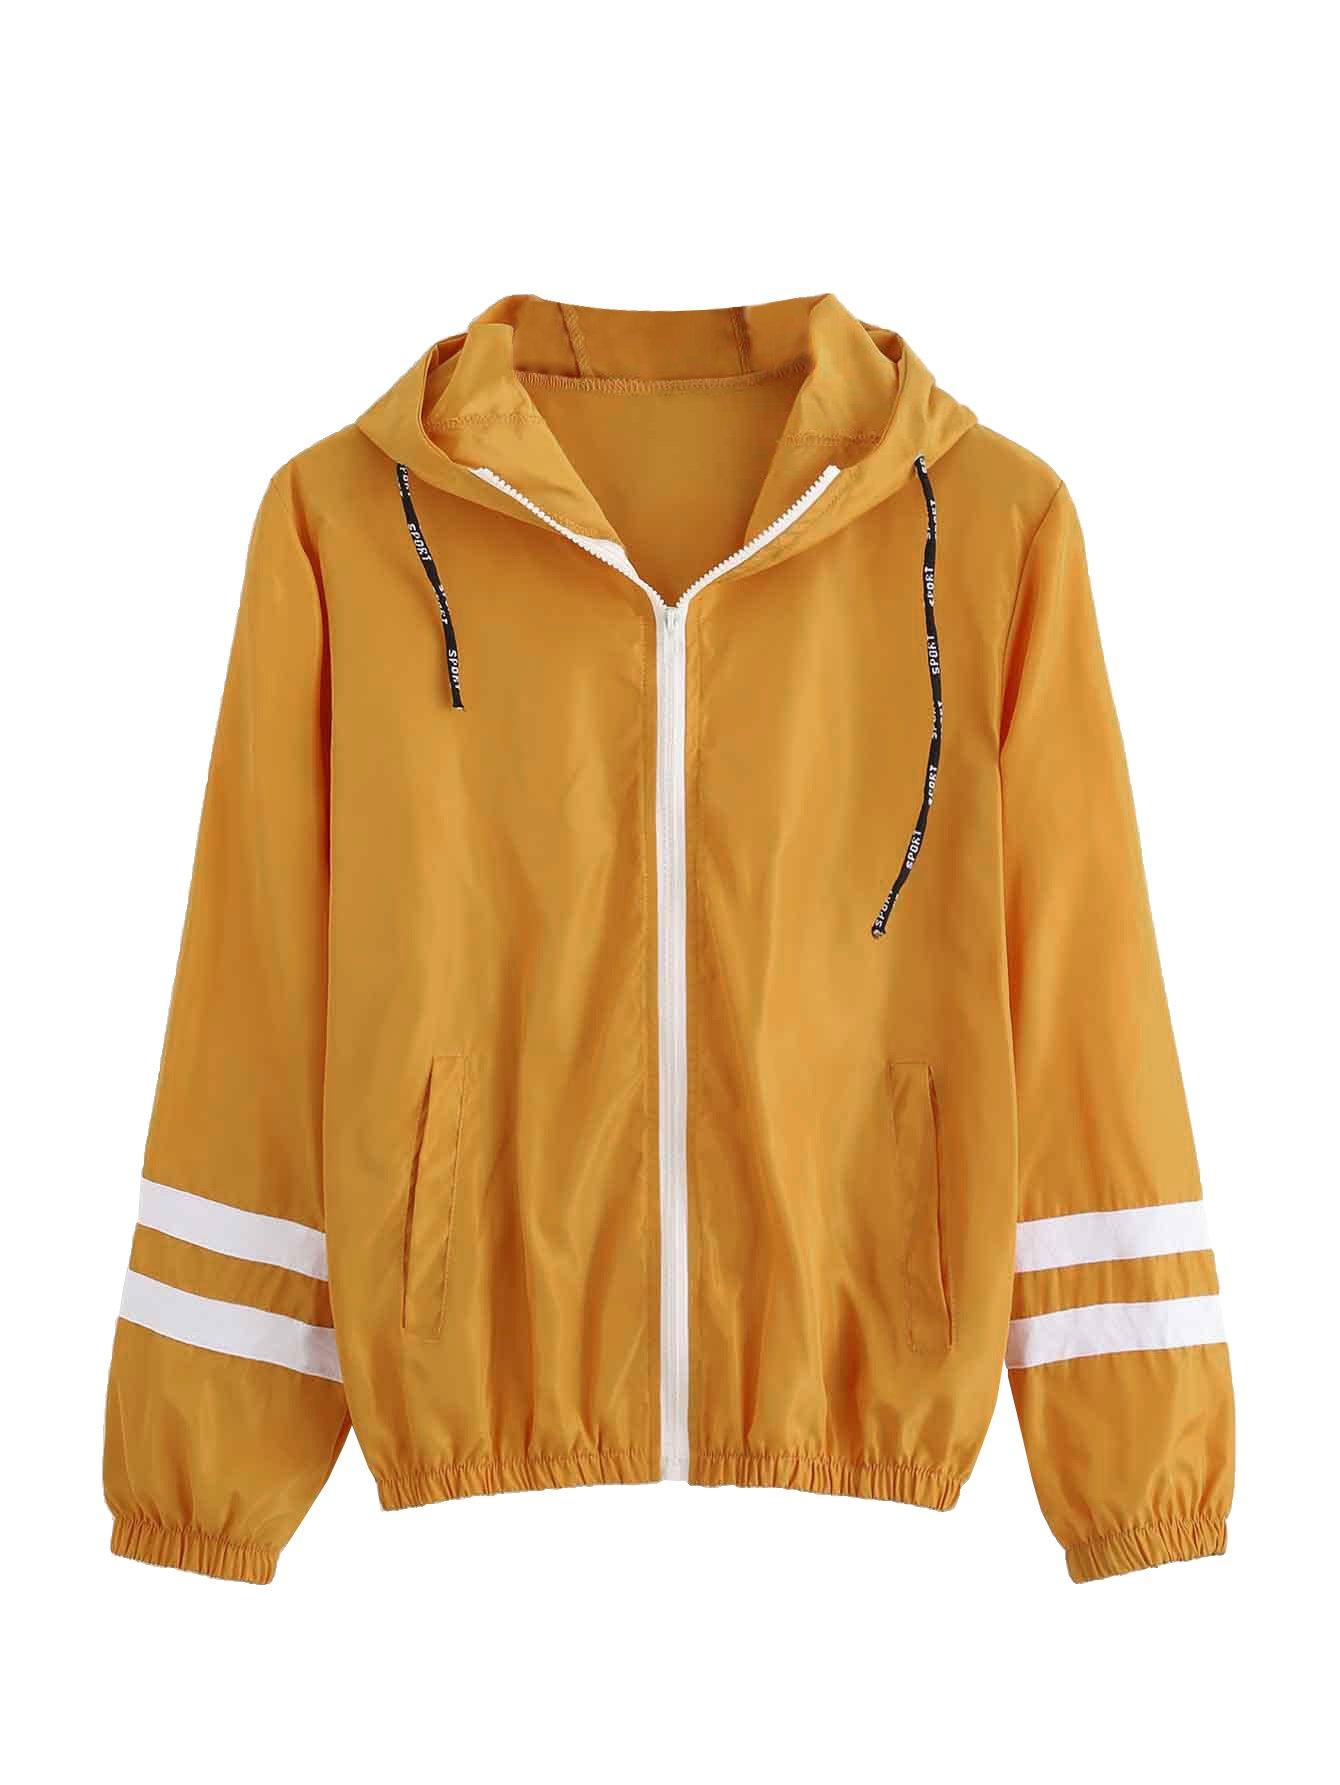 SweatyRocks Women's Colorful Splash Printing Zip up Windbreaker Jacket with Hood (X-Large, Mustard)